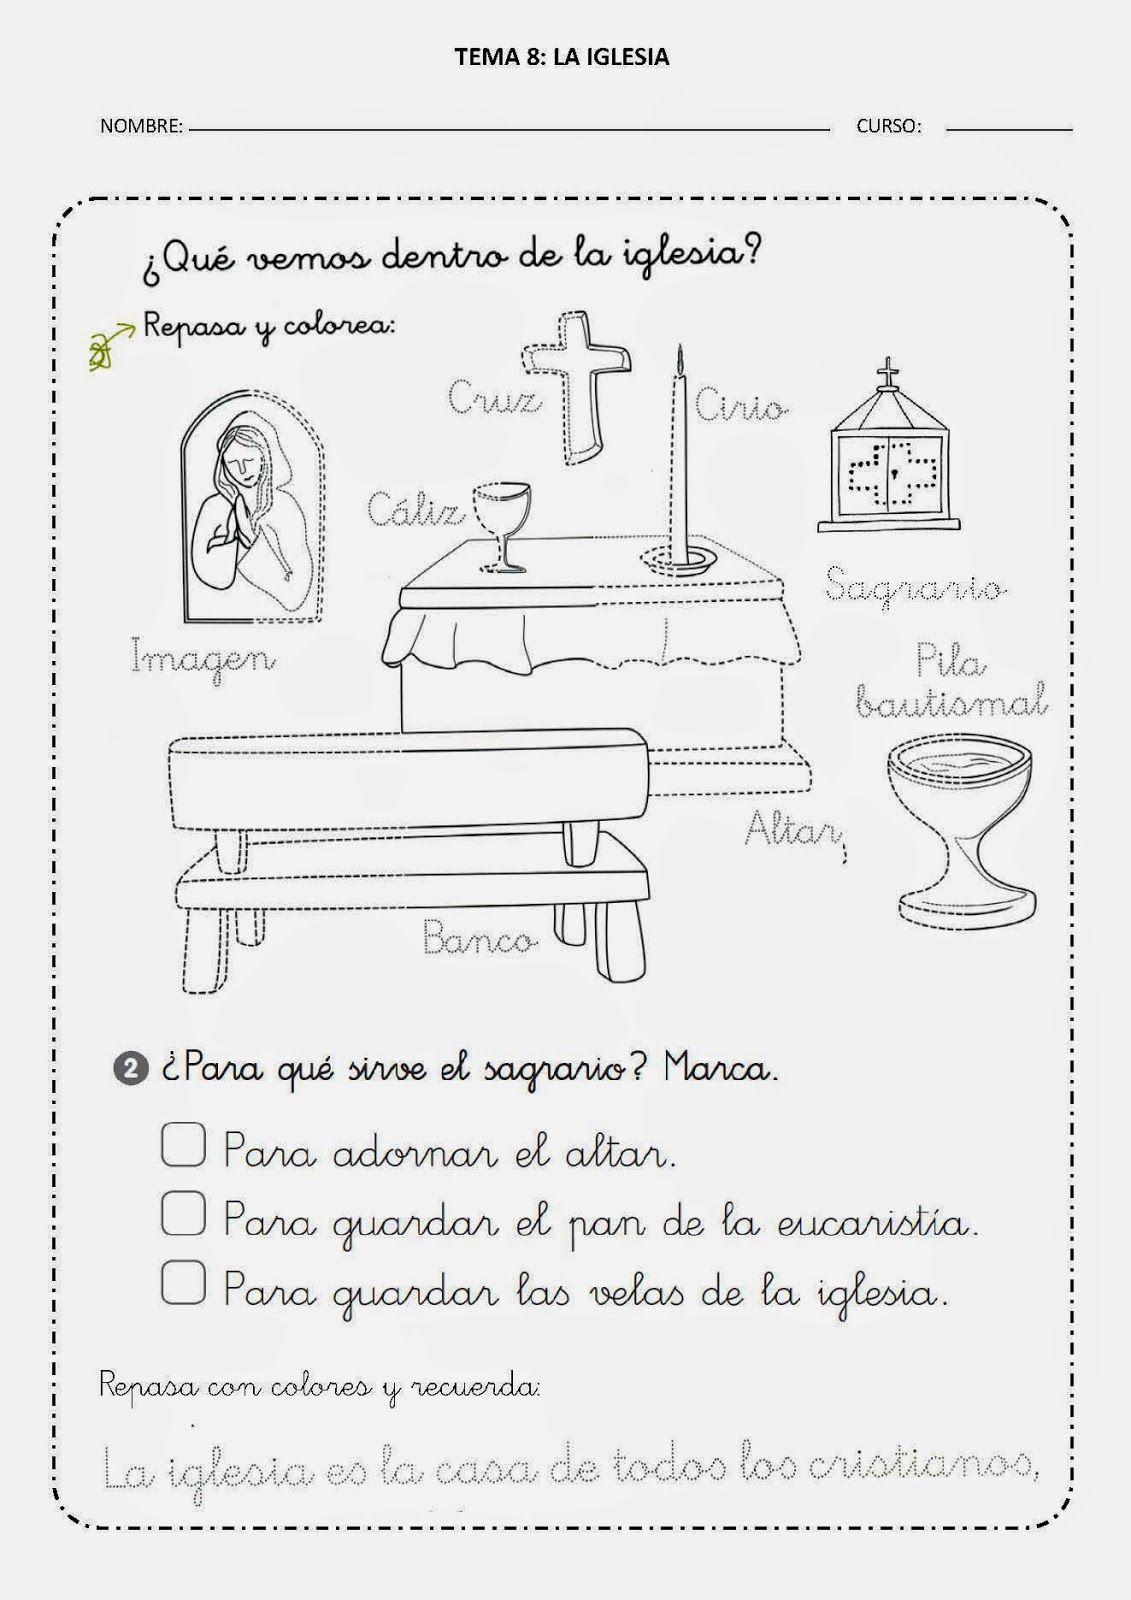 Aprendemos en reli: TEMA 8: LA IGLESIA - … | Amigos de Jesús | Pinte…